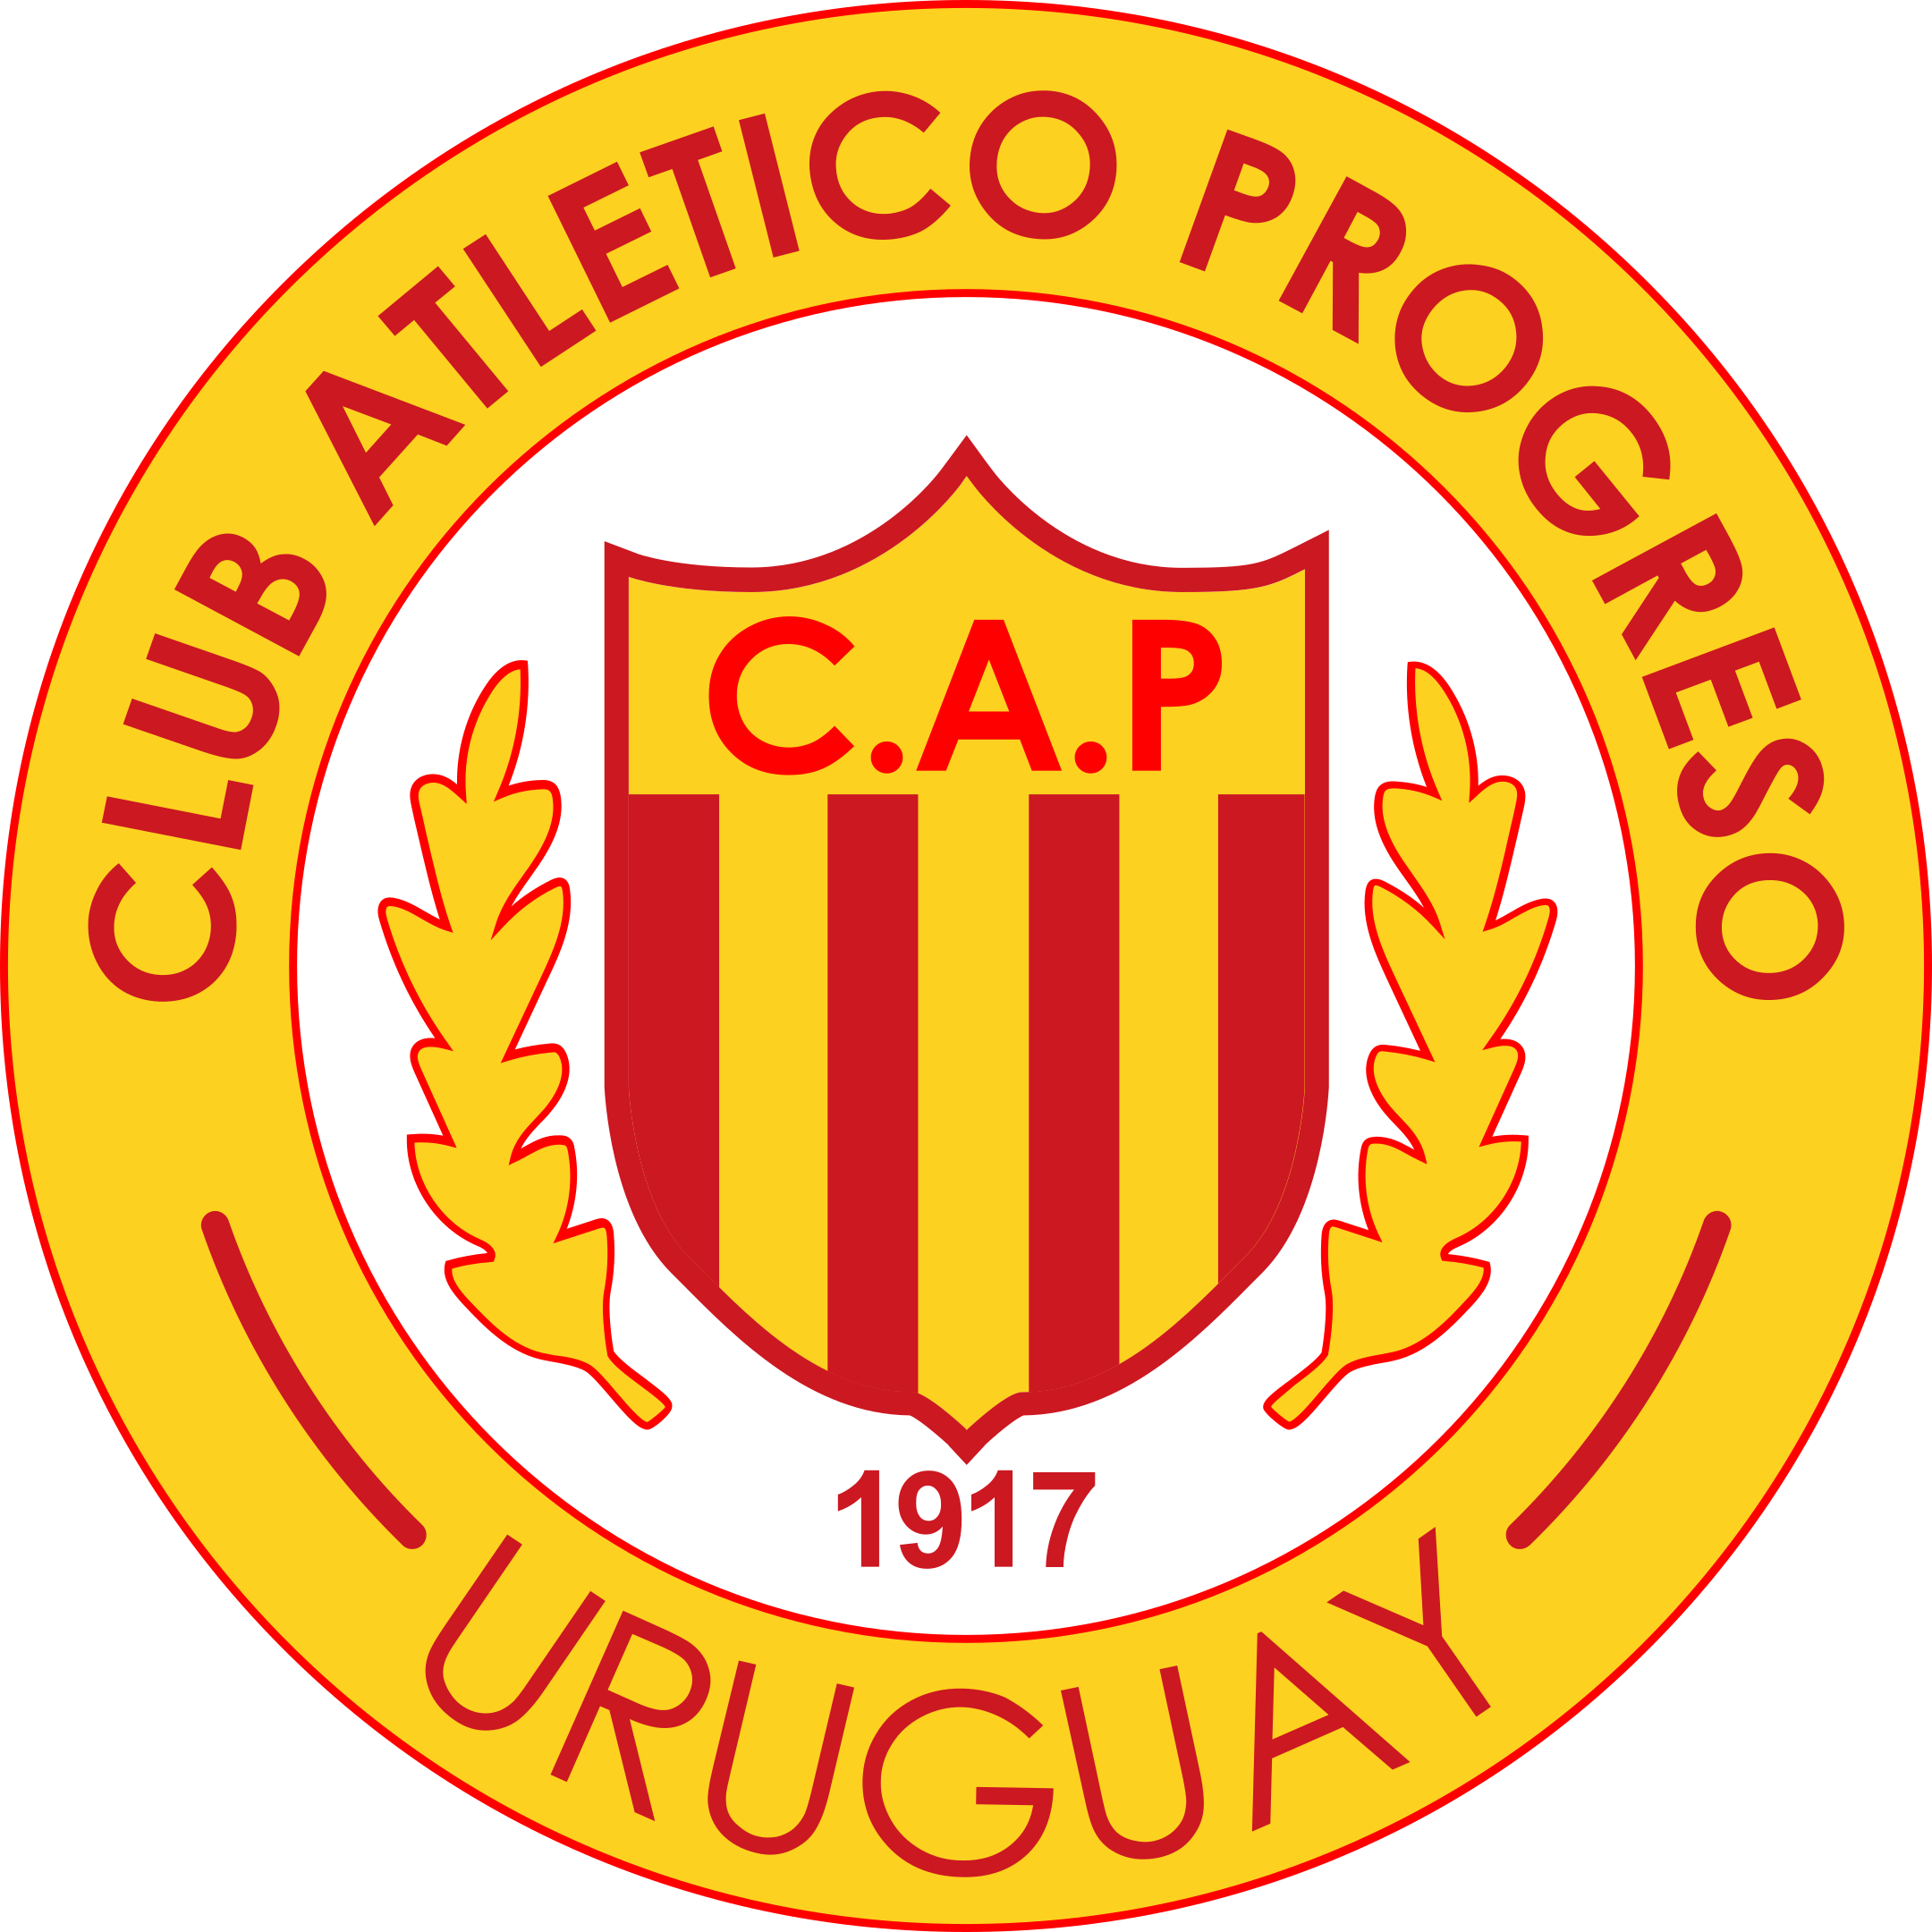 cd progreso logo escudo 1 - Club Atlético Progreso Logo - Escudo